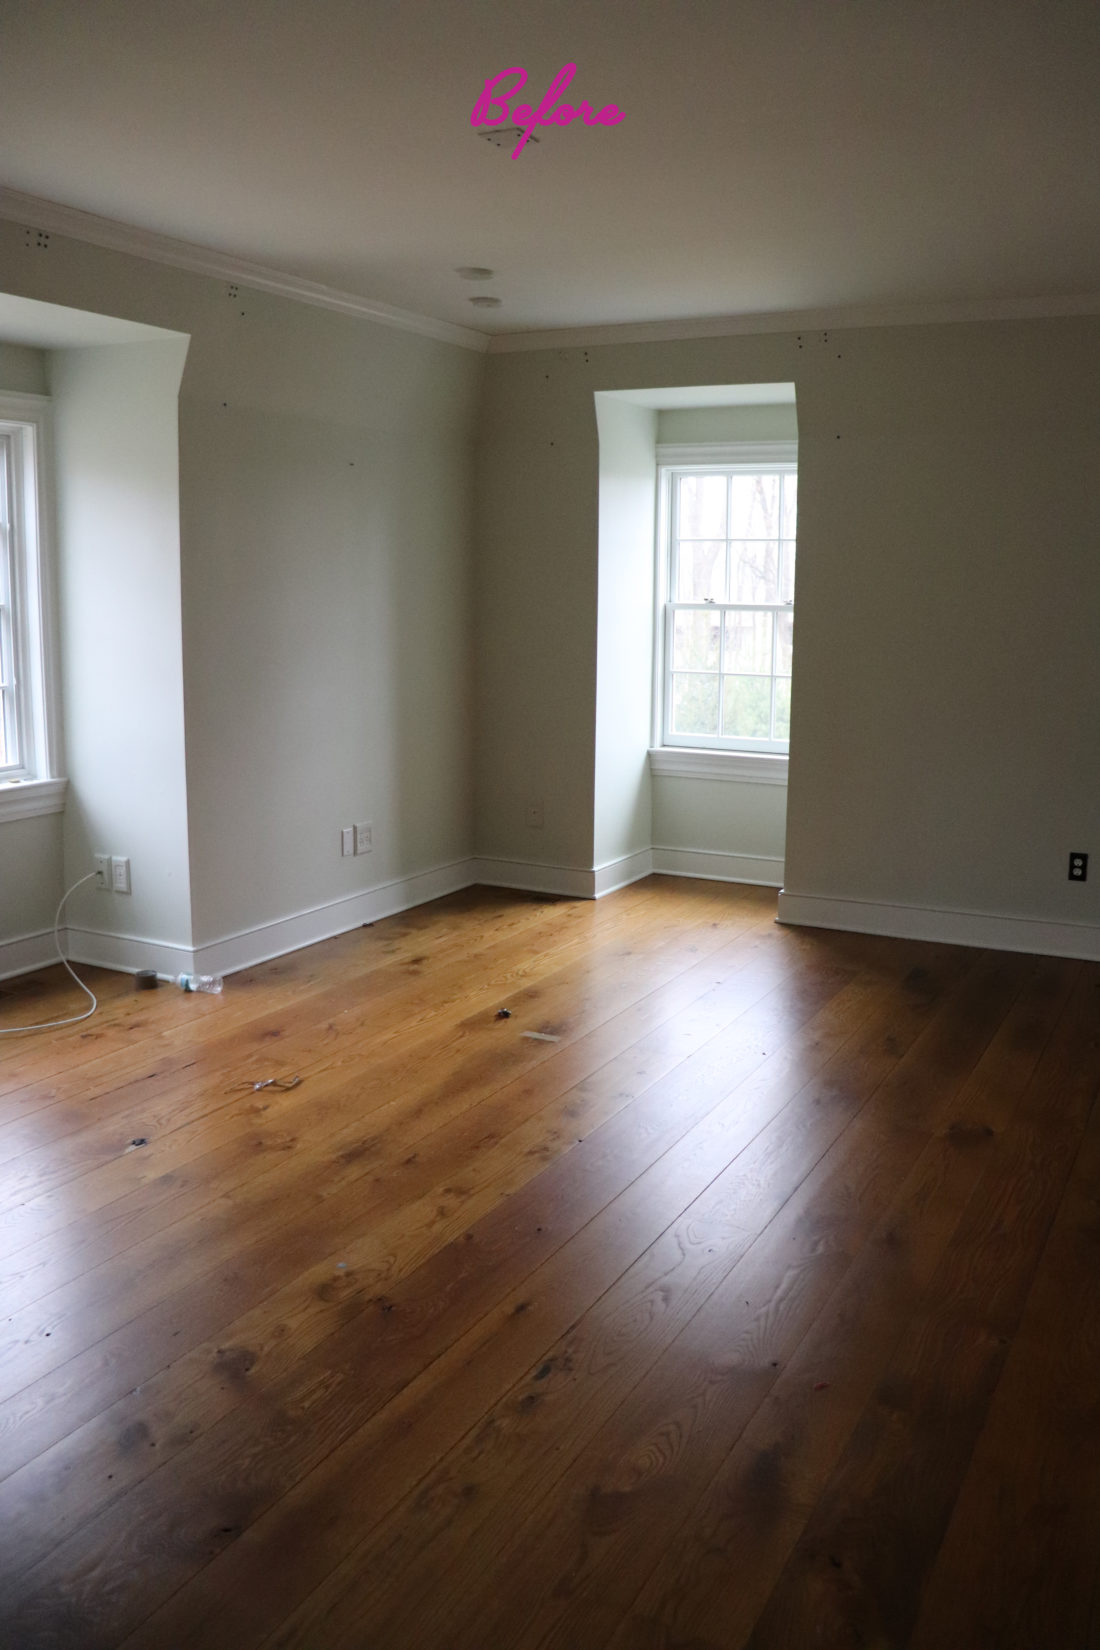 Eva Amurri Martino's master bedroom before renovation and remodeling